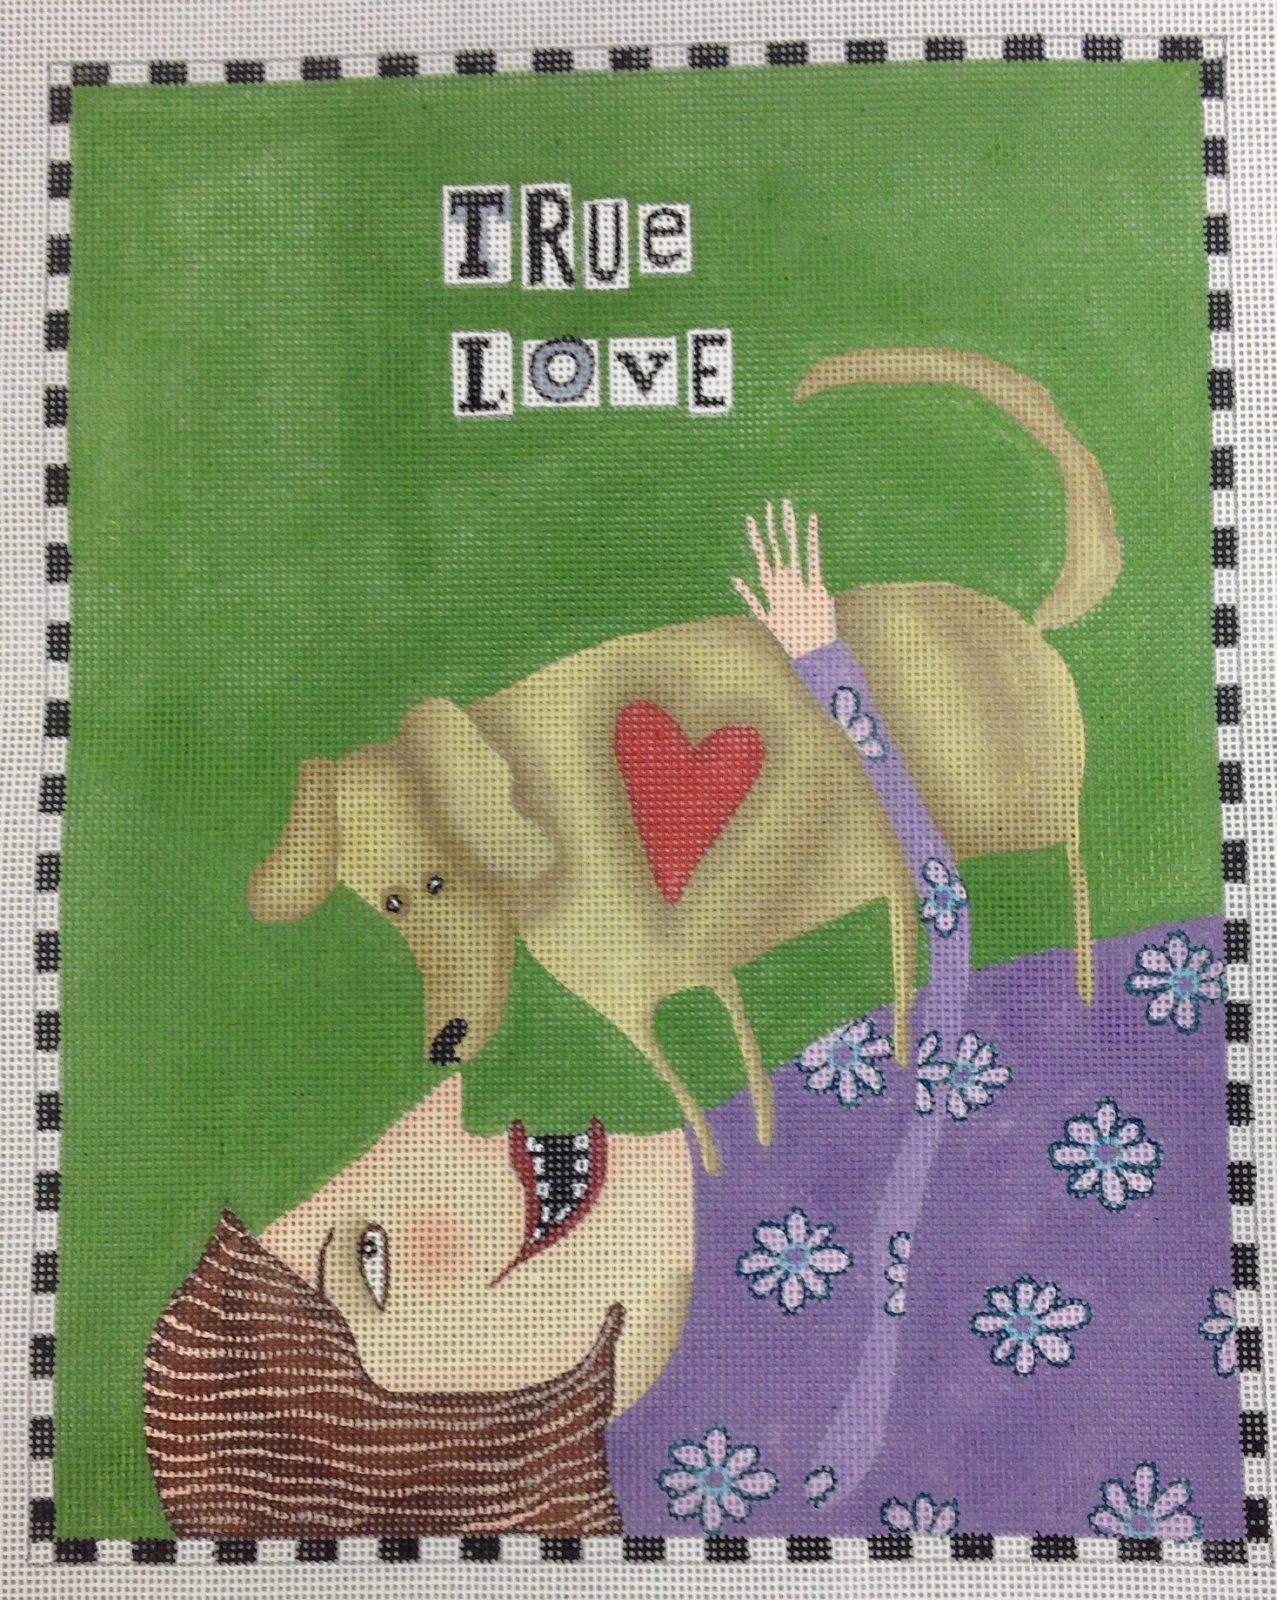 true love, dog*